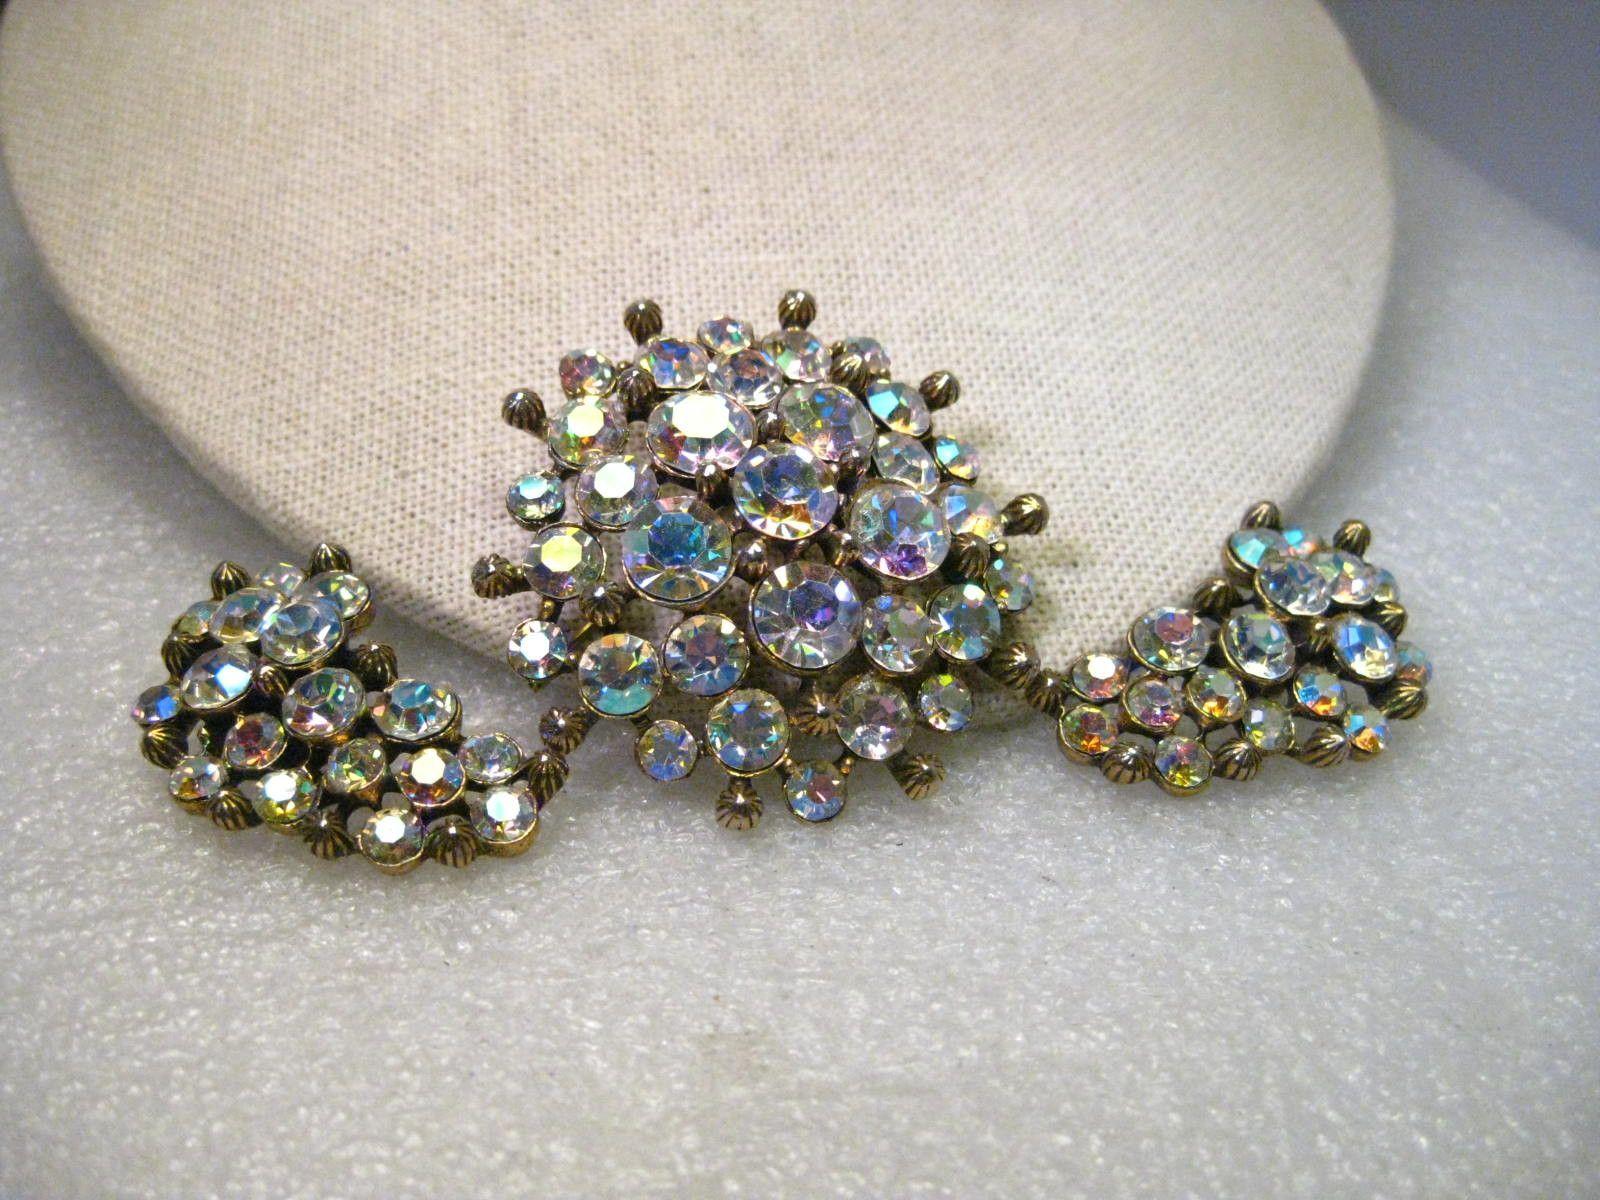 Clip Earrings Vintage Jewelry Set with Rhinestones Brooch Gold Tone Aurora-borealis